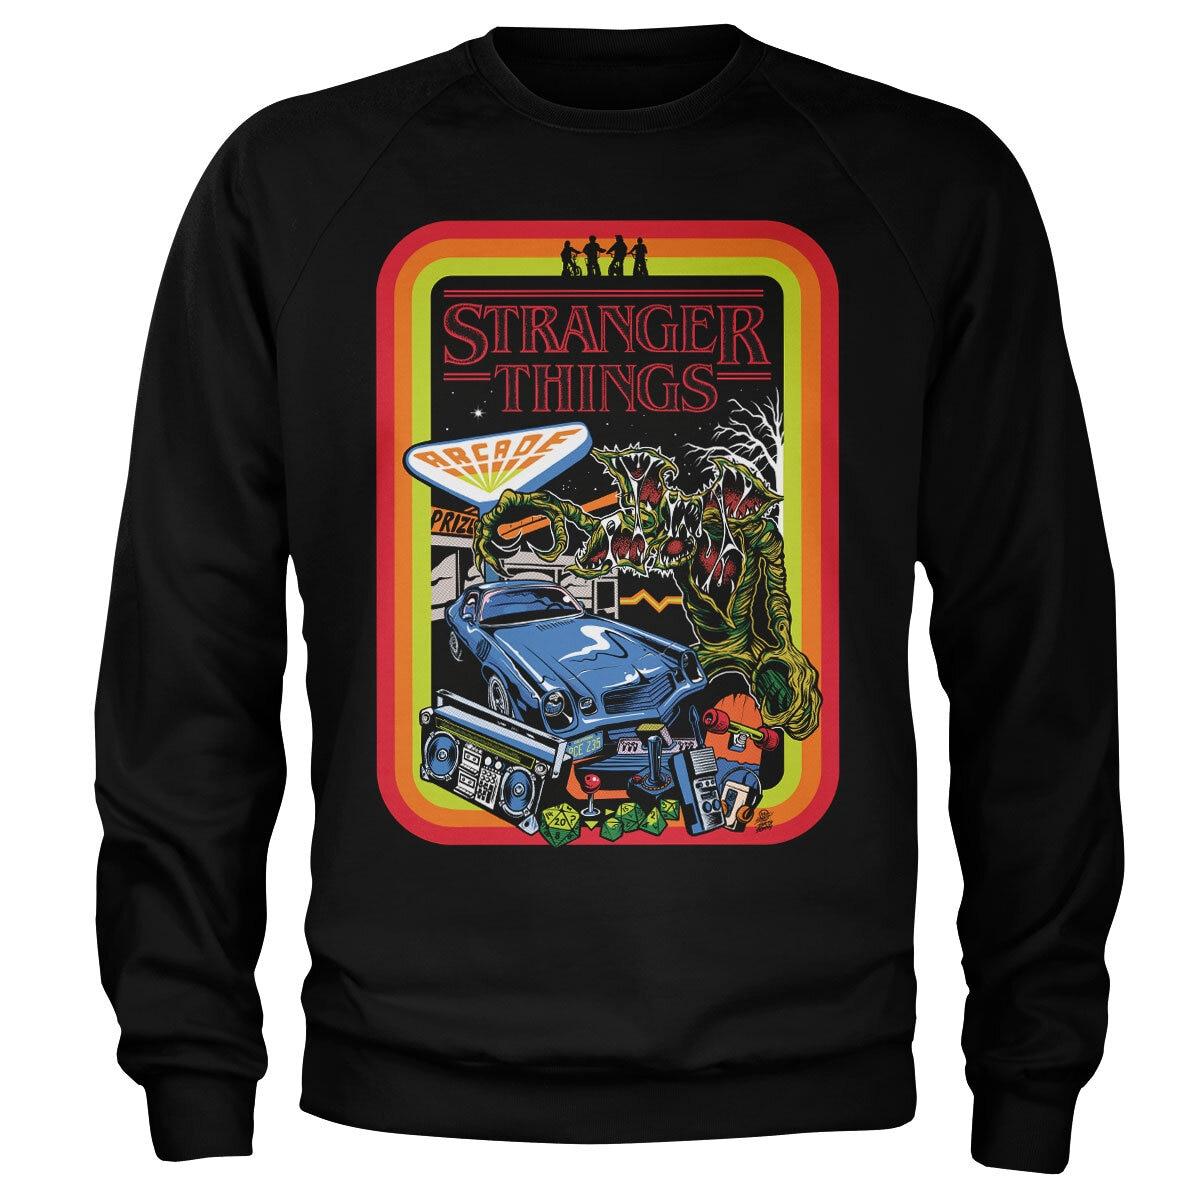 Stranger Things Retro Poster Sweatshirt